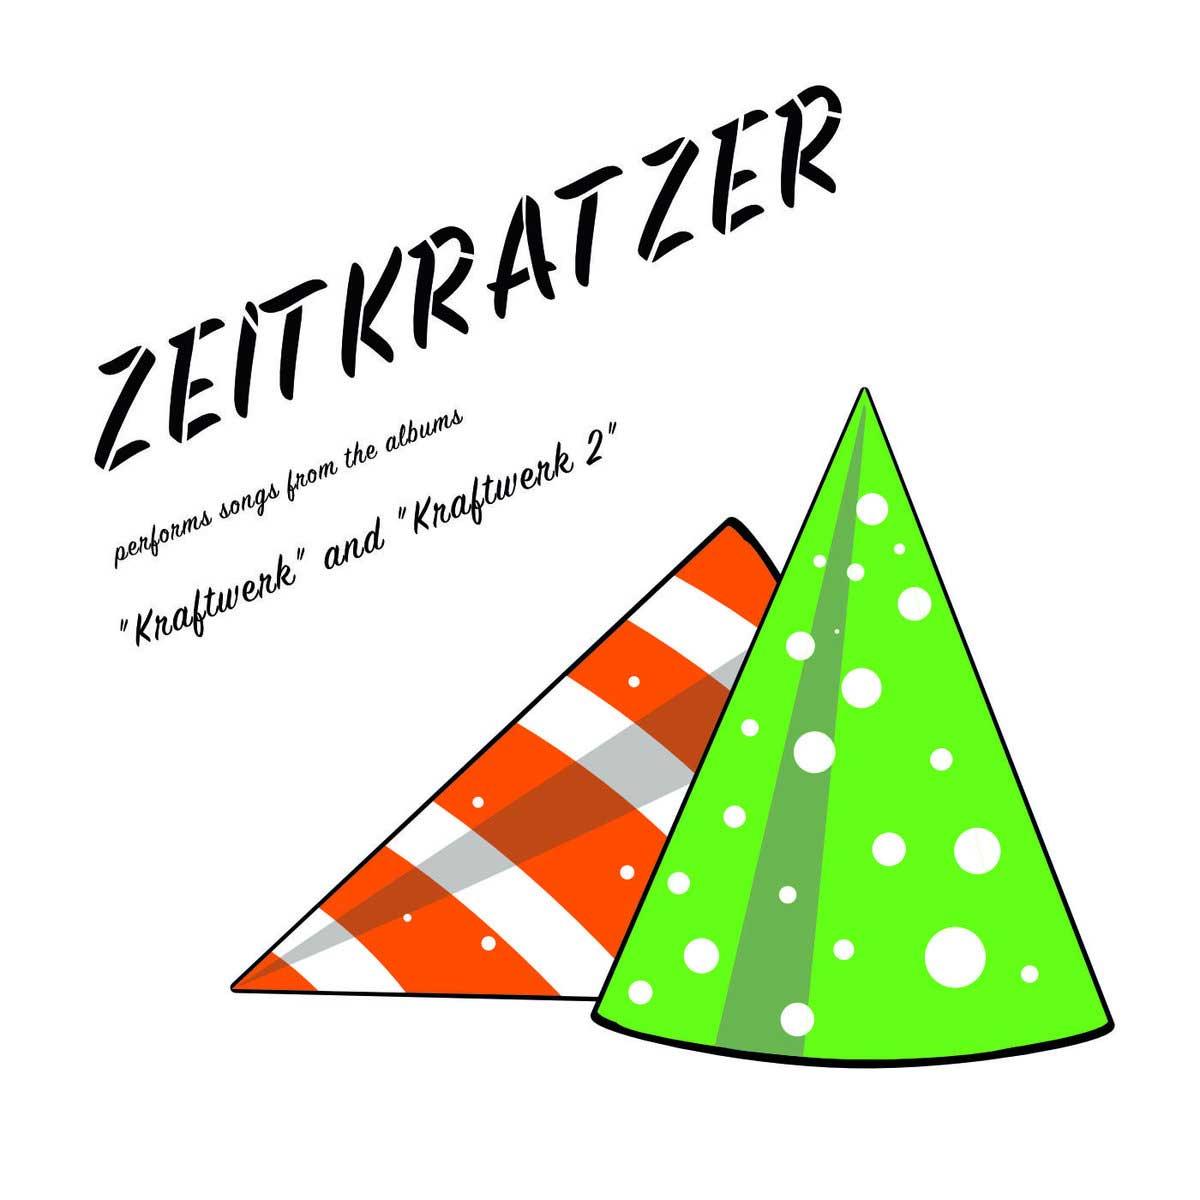 Zeitkratzer Performs Songs From